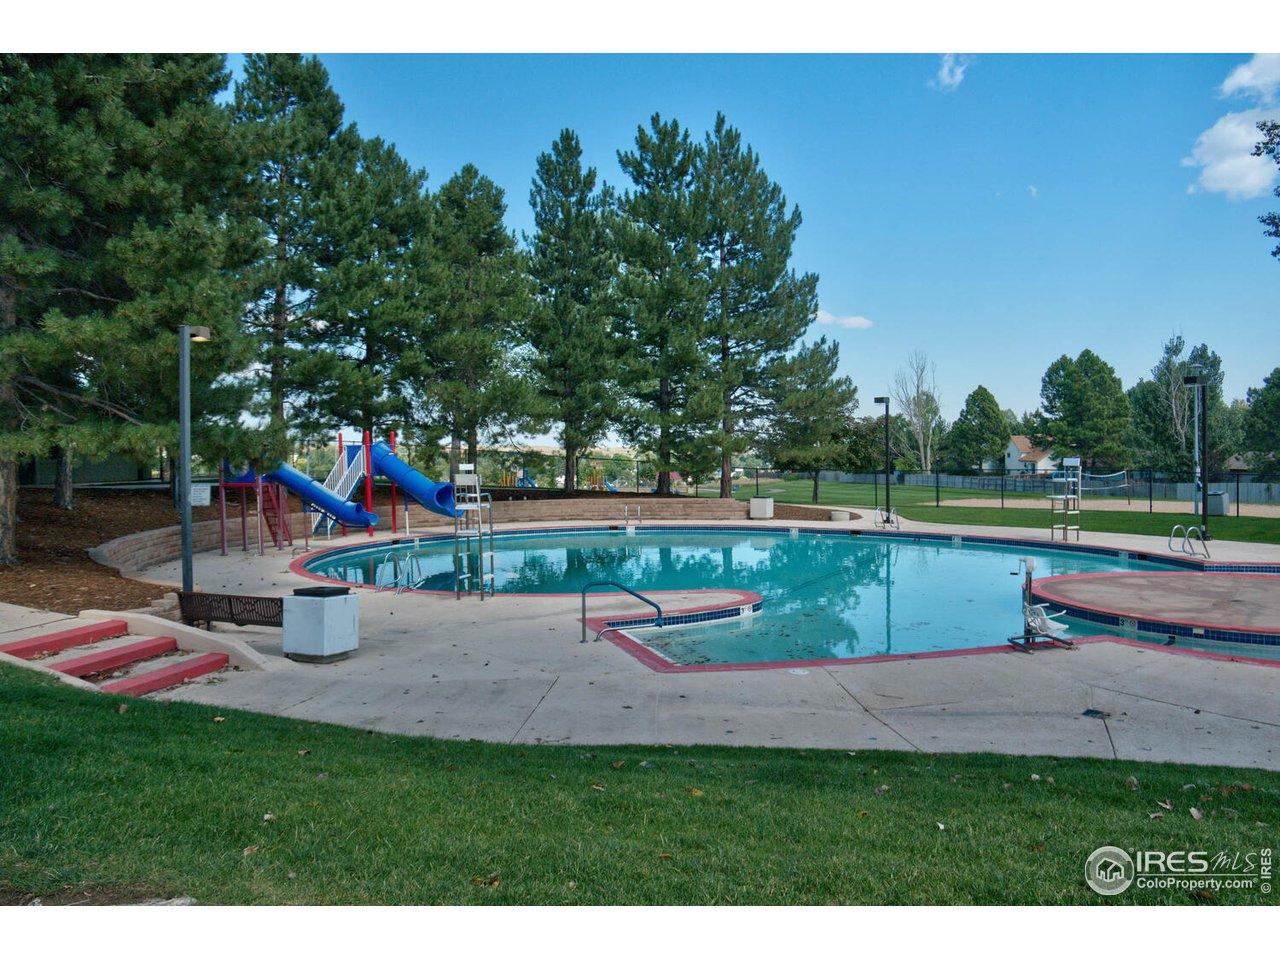 Countryside Community Pool